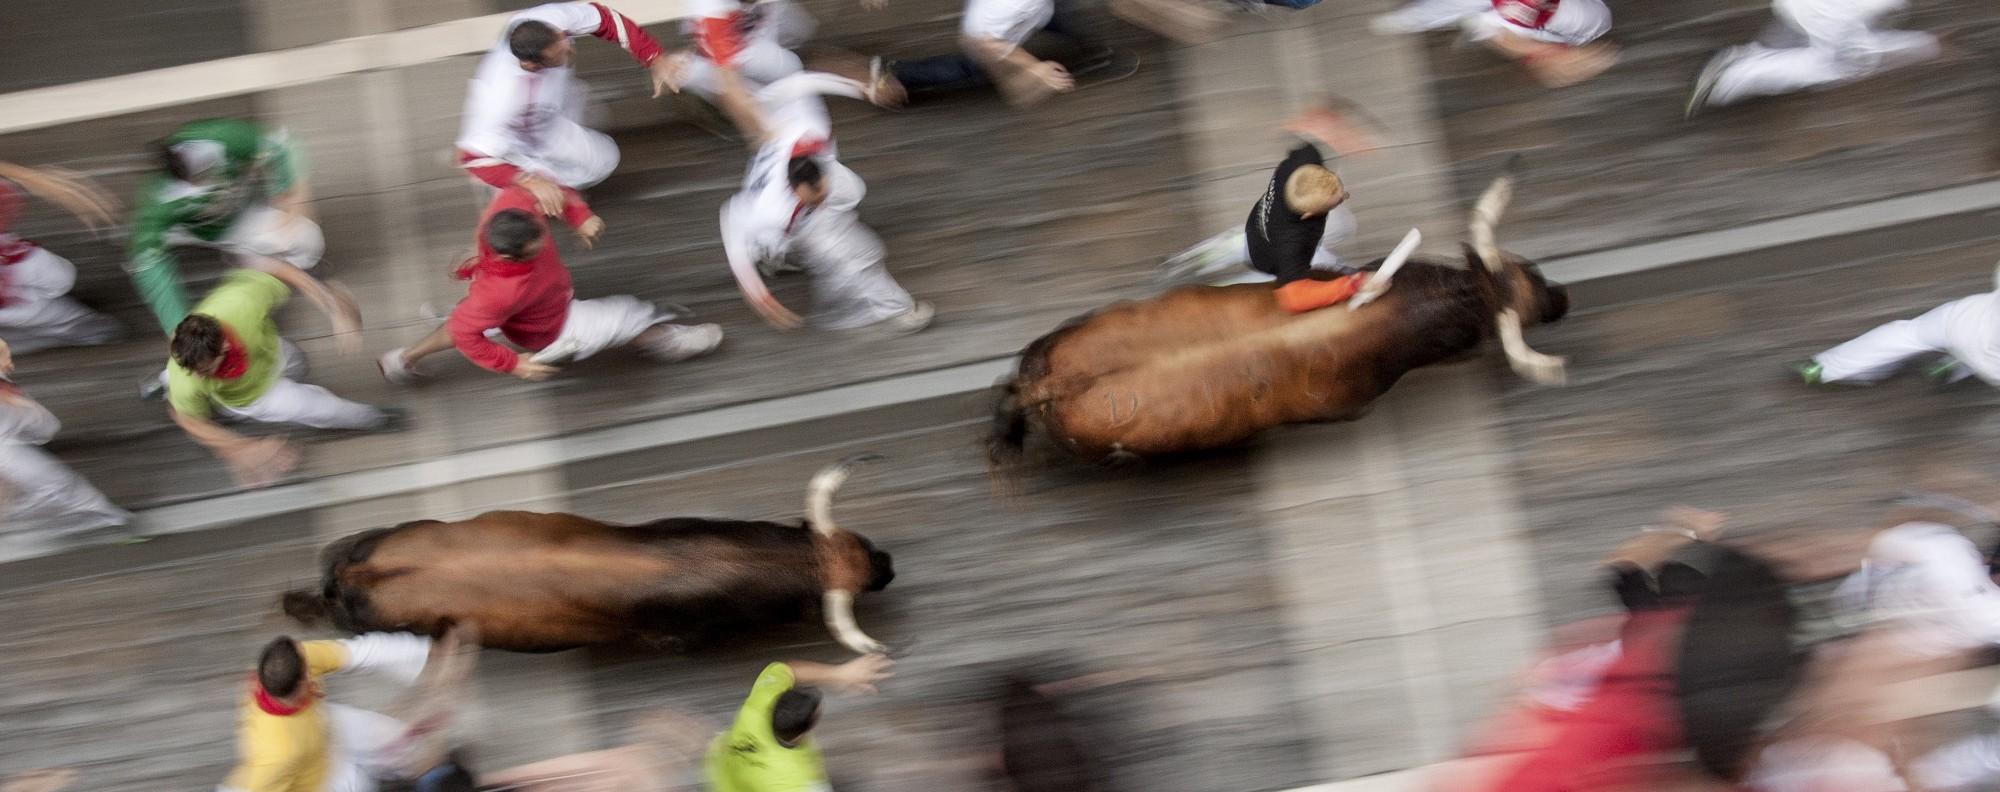 The bull run in Pamplona, Spain.